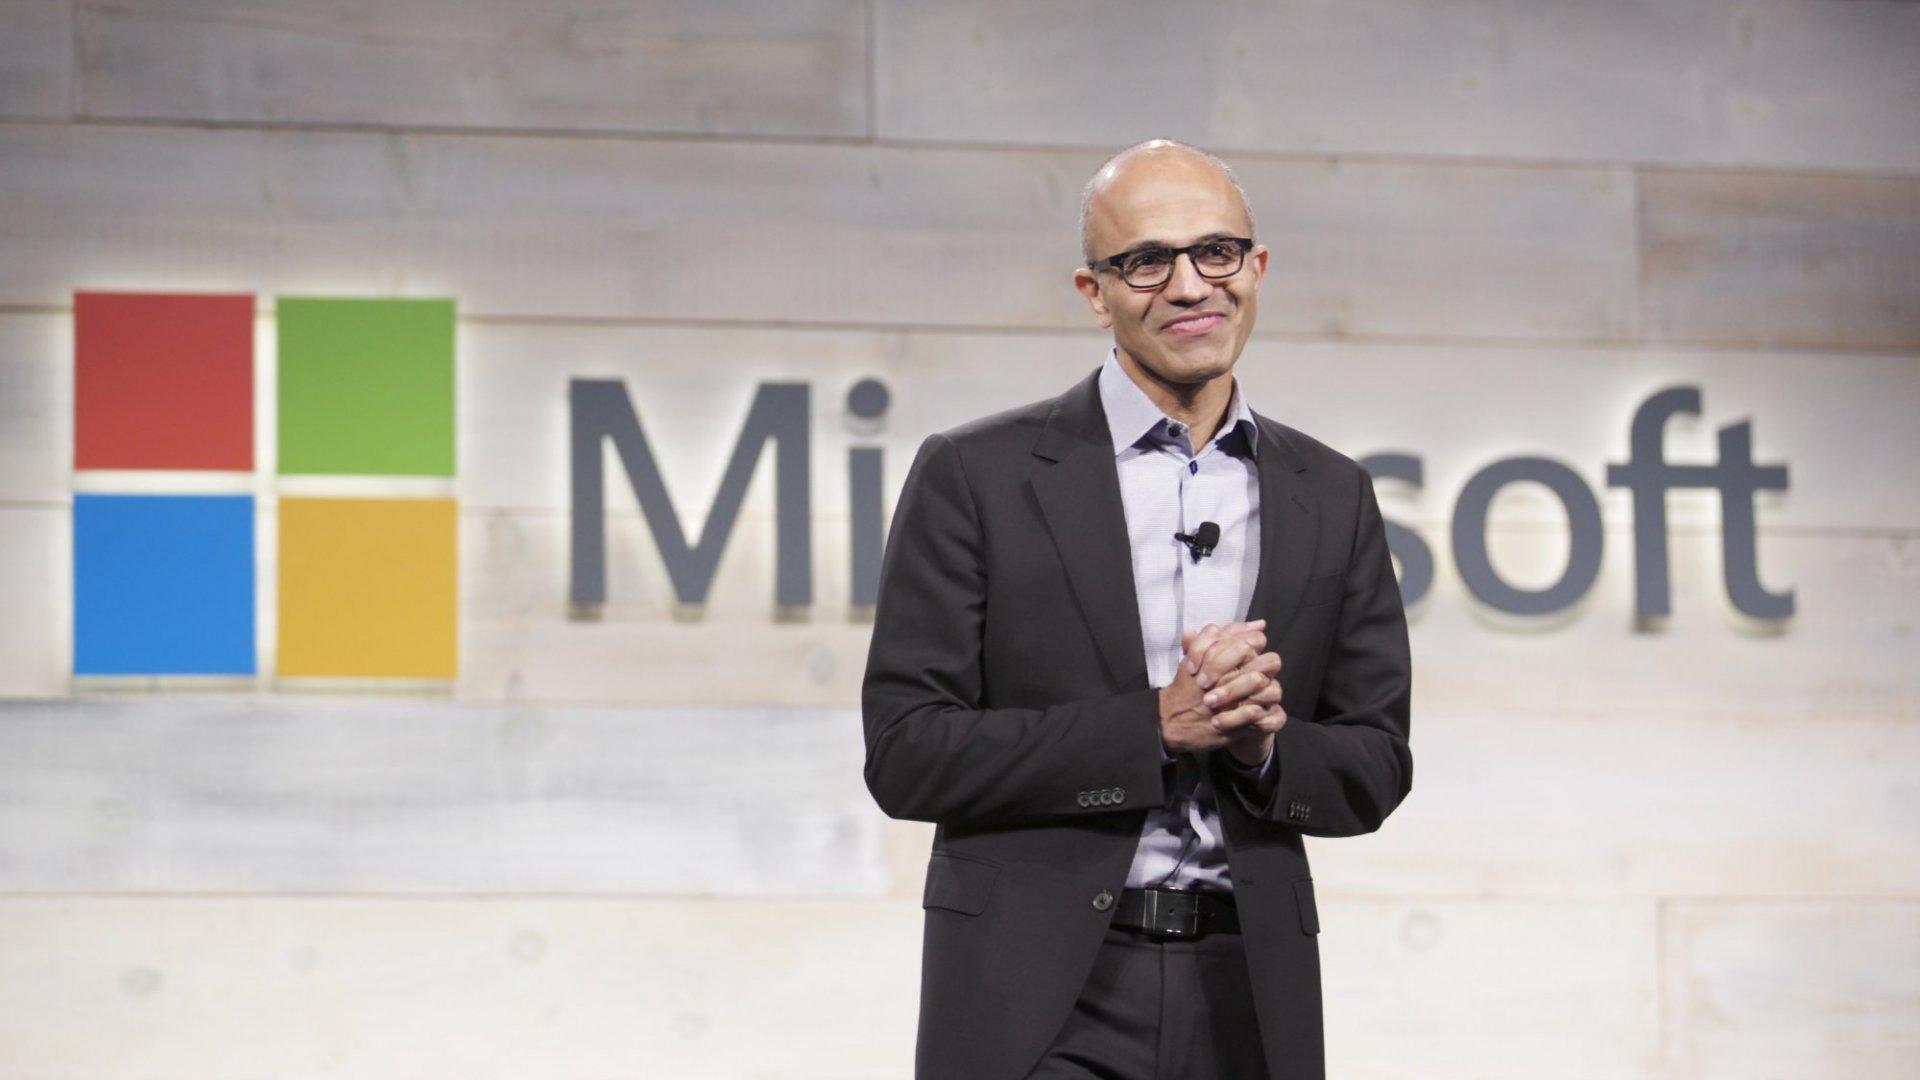 Microsoft Posts $28.92 Billion Revenue in Q2